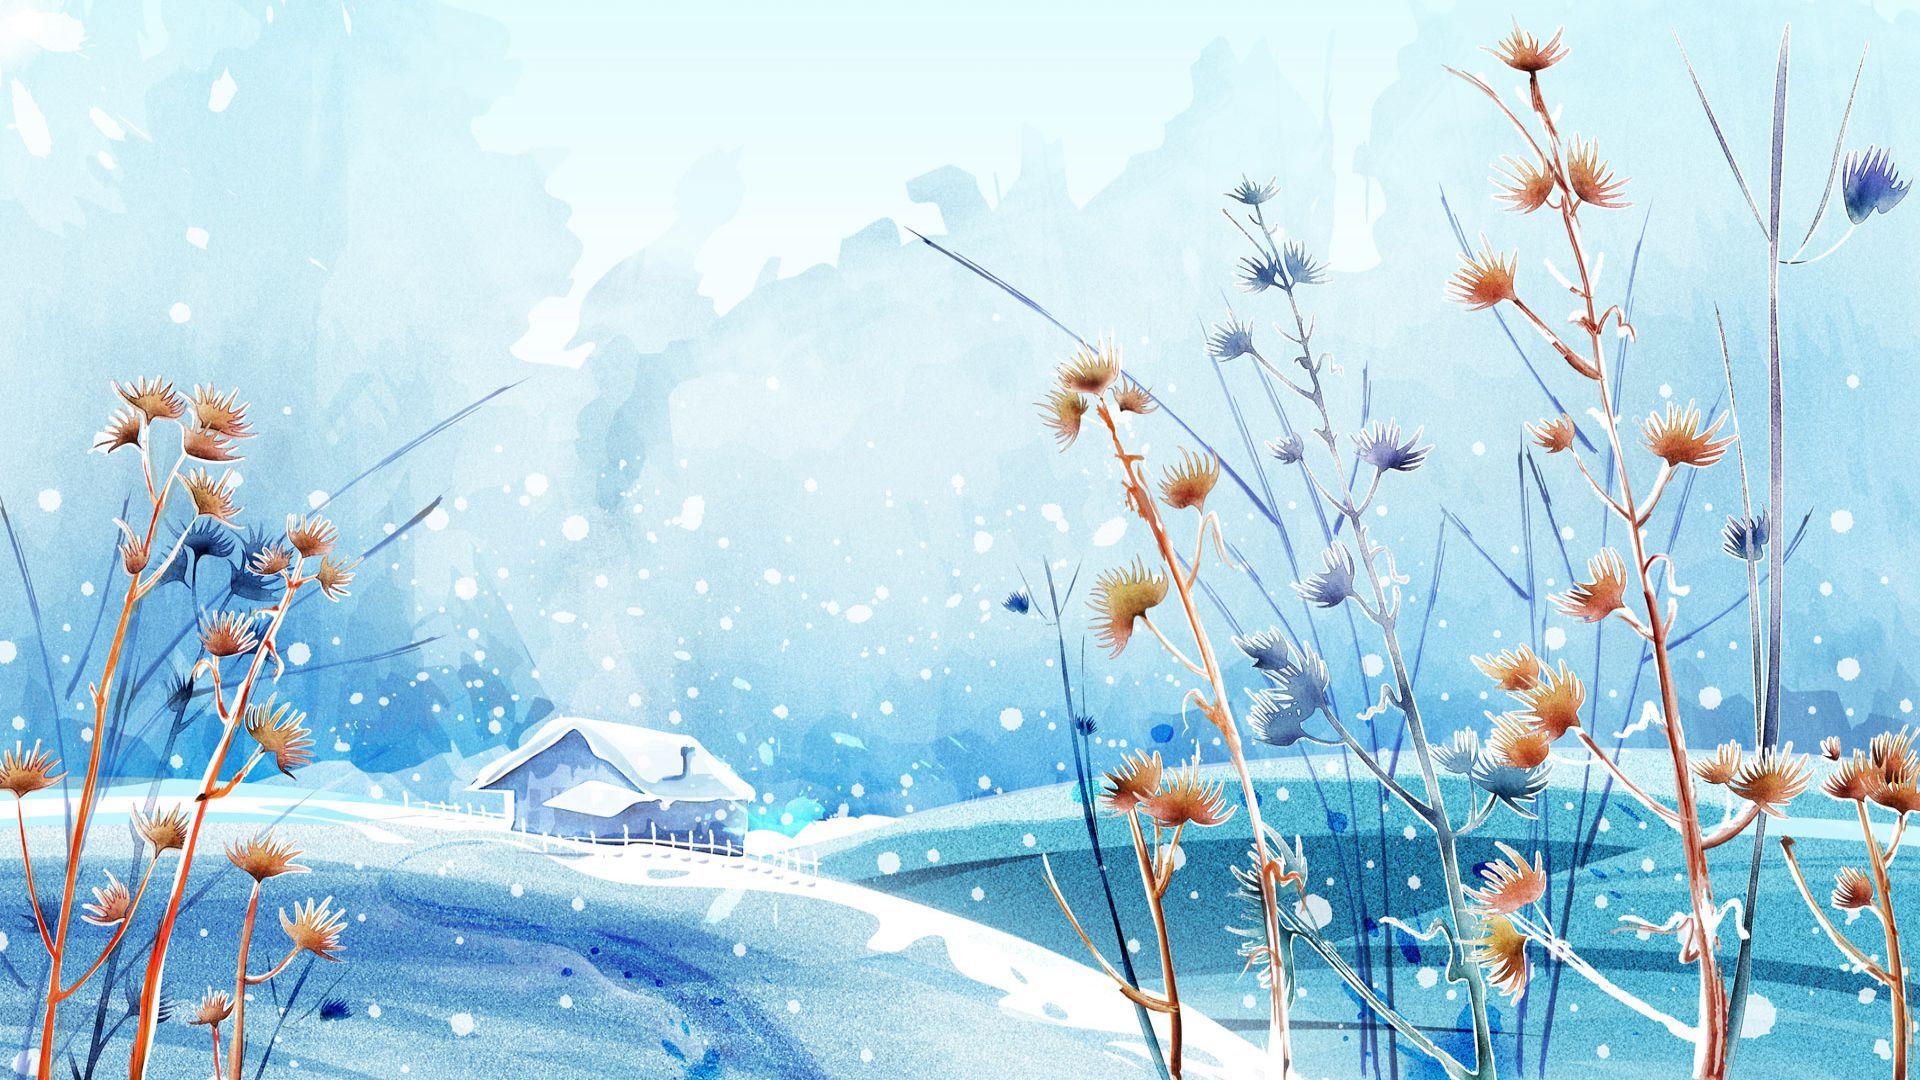 Nature Anime Winter Scenery Background Wallpaper